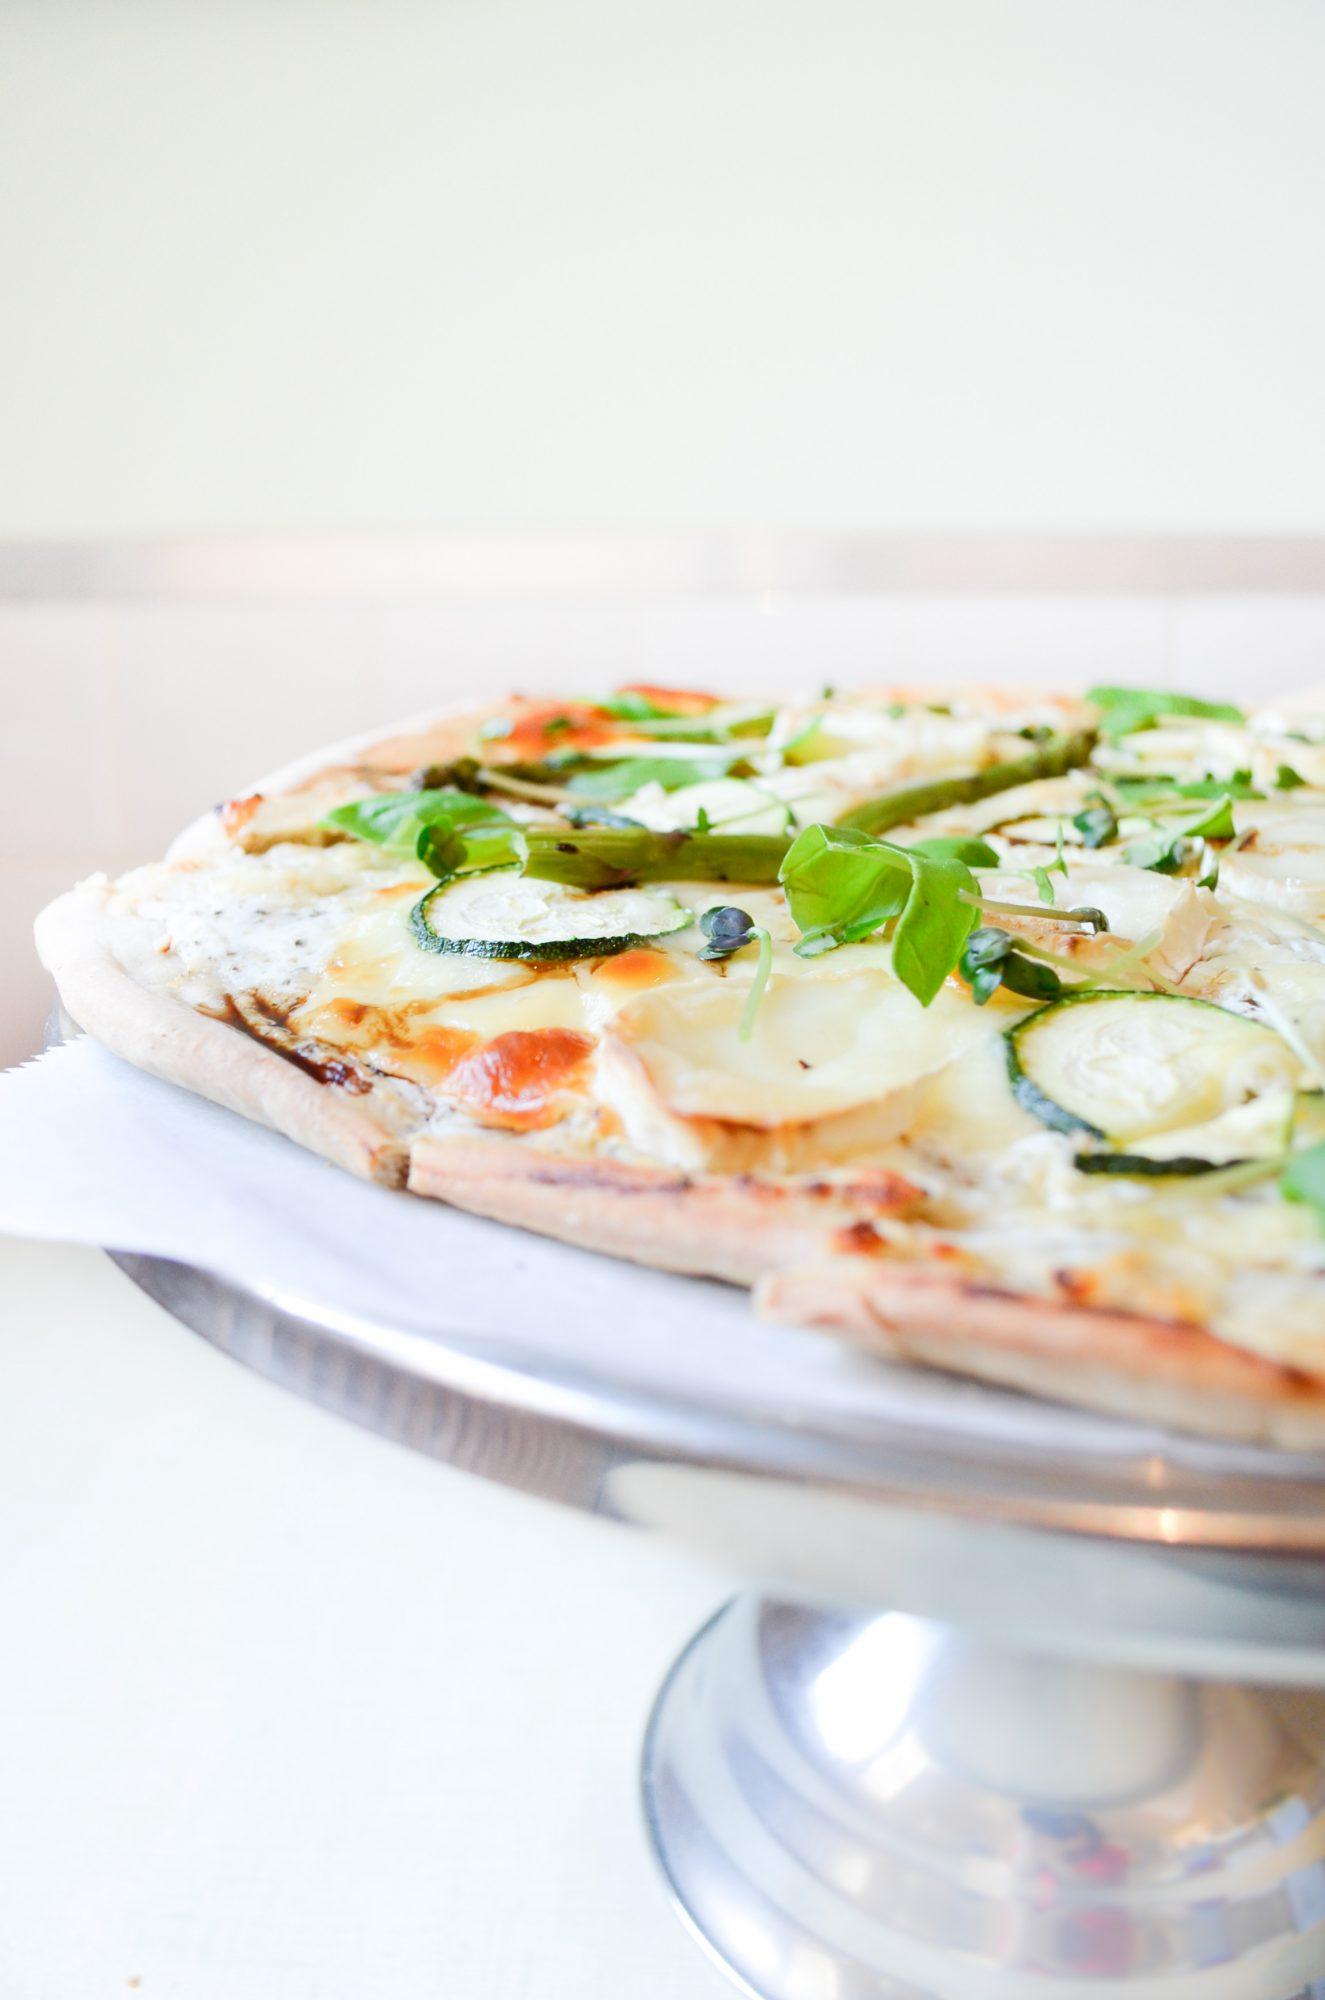 pizza sarrasin ricotta chevre courgette asperge basilic origan radis noir mozzarella